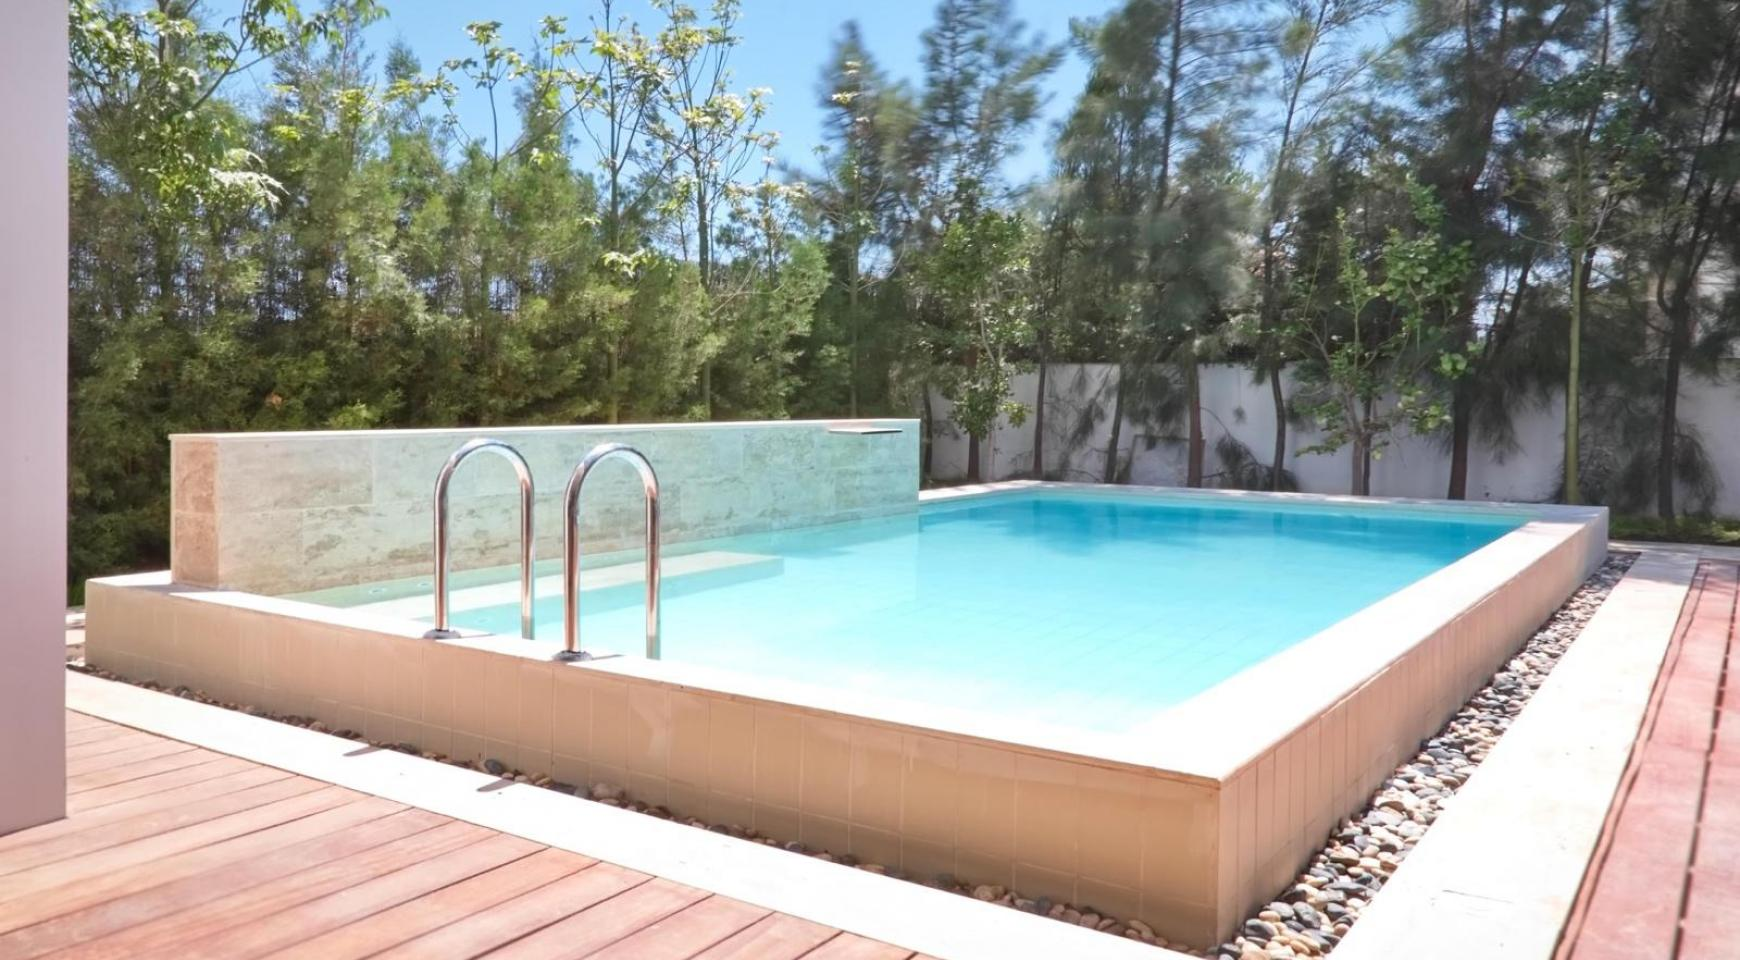 New Luxurious 4 Bedroom Villa in the Tourist Area - 2